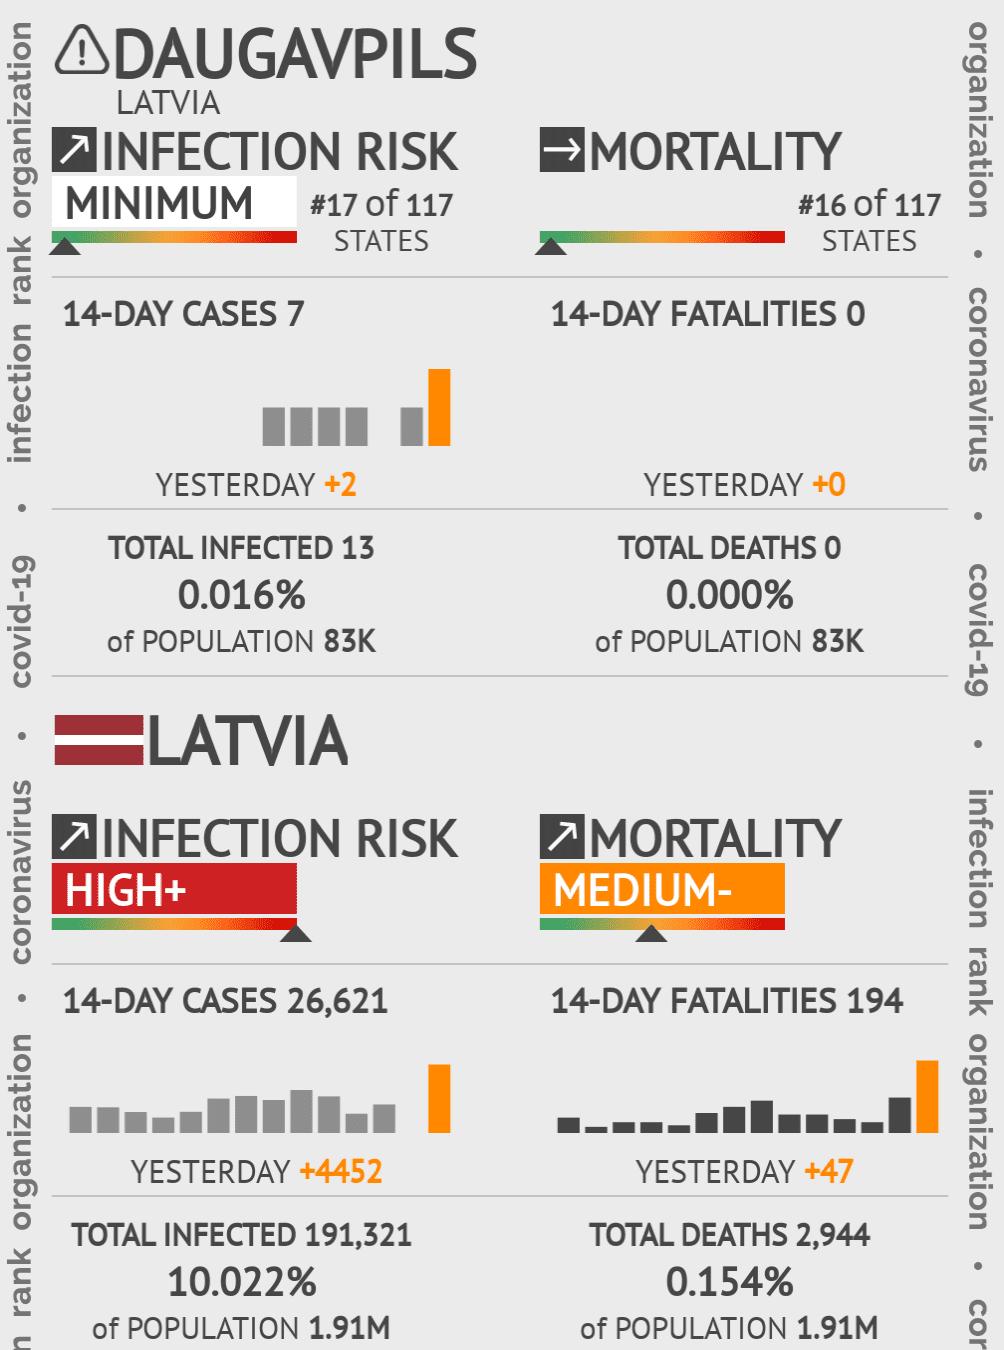 Daugavpils Coronavirus Covid-19 Risk of Infection on May 14, 2020